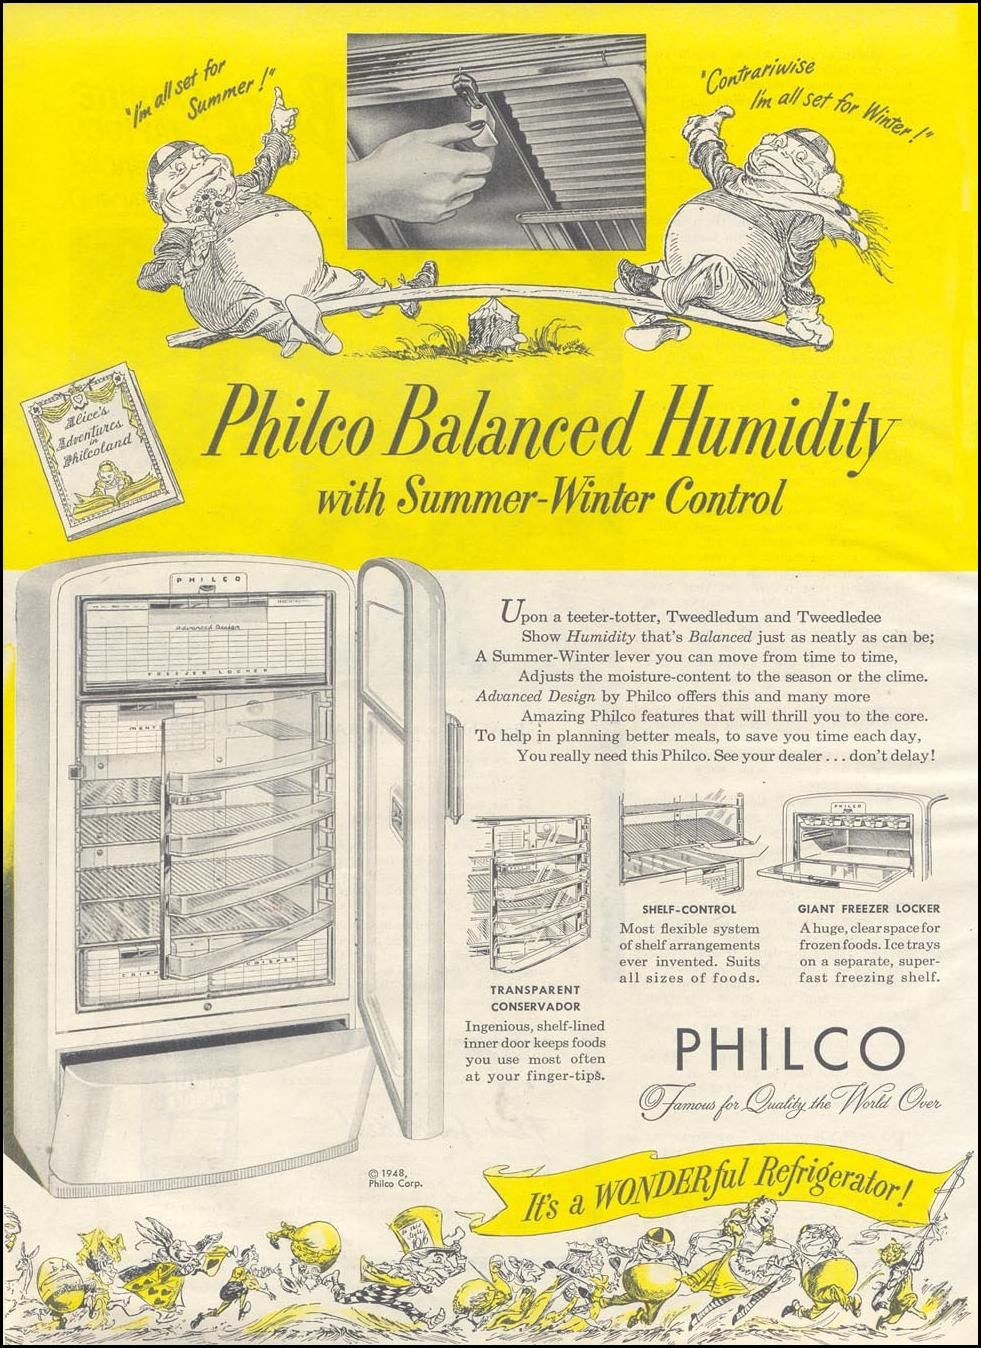 PHILCO REFRIGERATORS GOOD HOUSEKEEPING 07/01/1948 p. 124